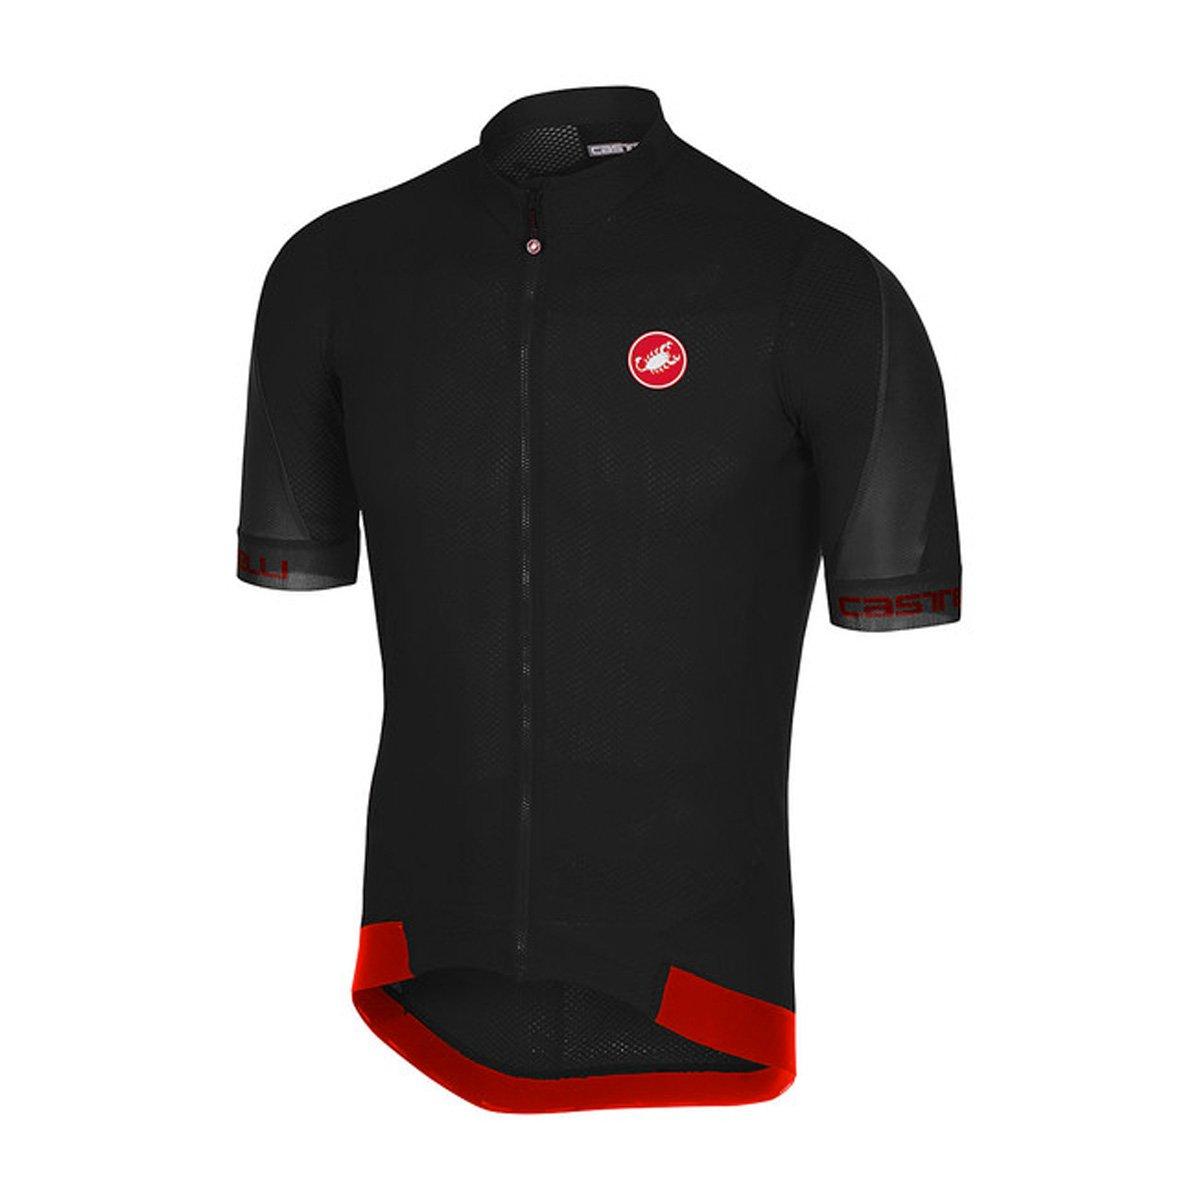 CastelliメンズVolata 2 Bike jersey fz B07B4DVY96 X-Large|Light Black/Anthracite Light Black/Anthracite X-Large